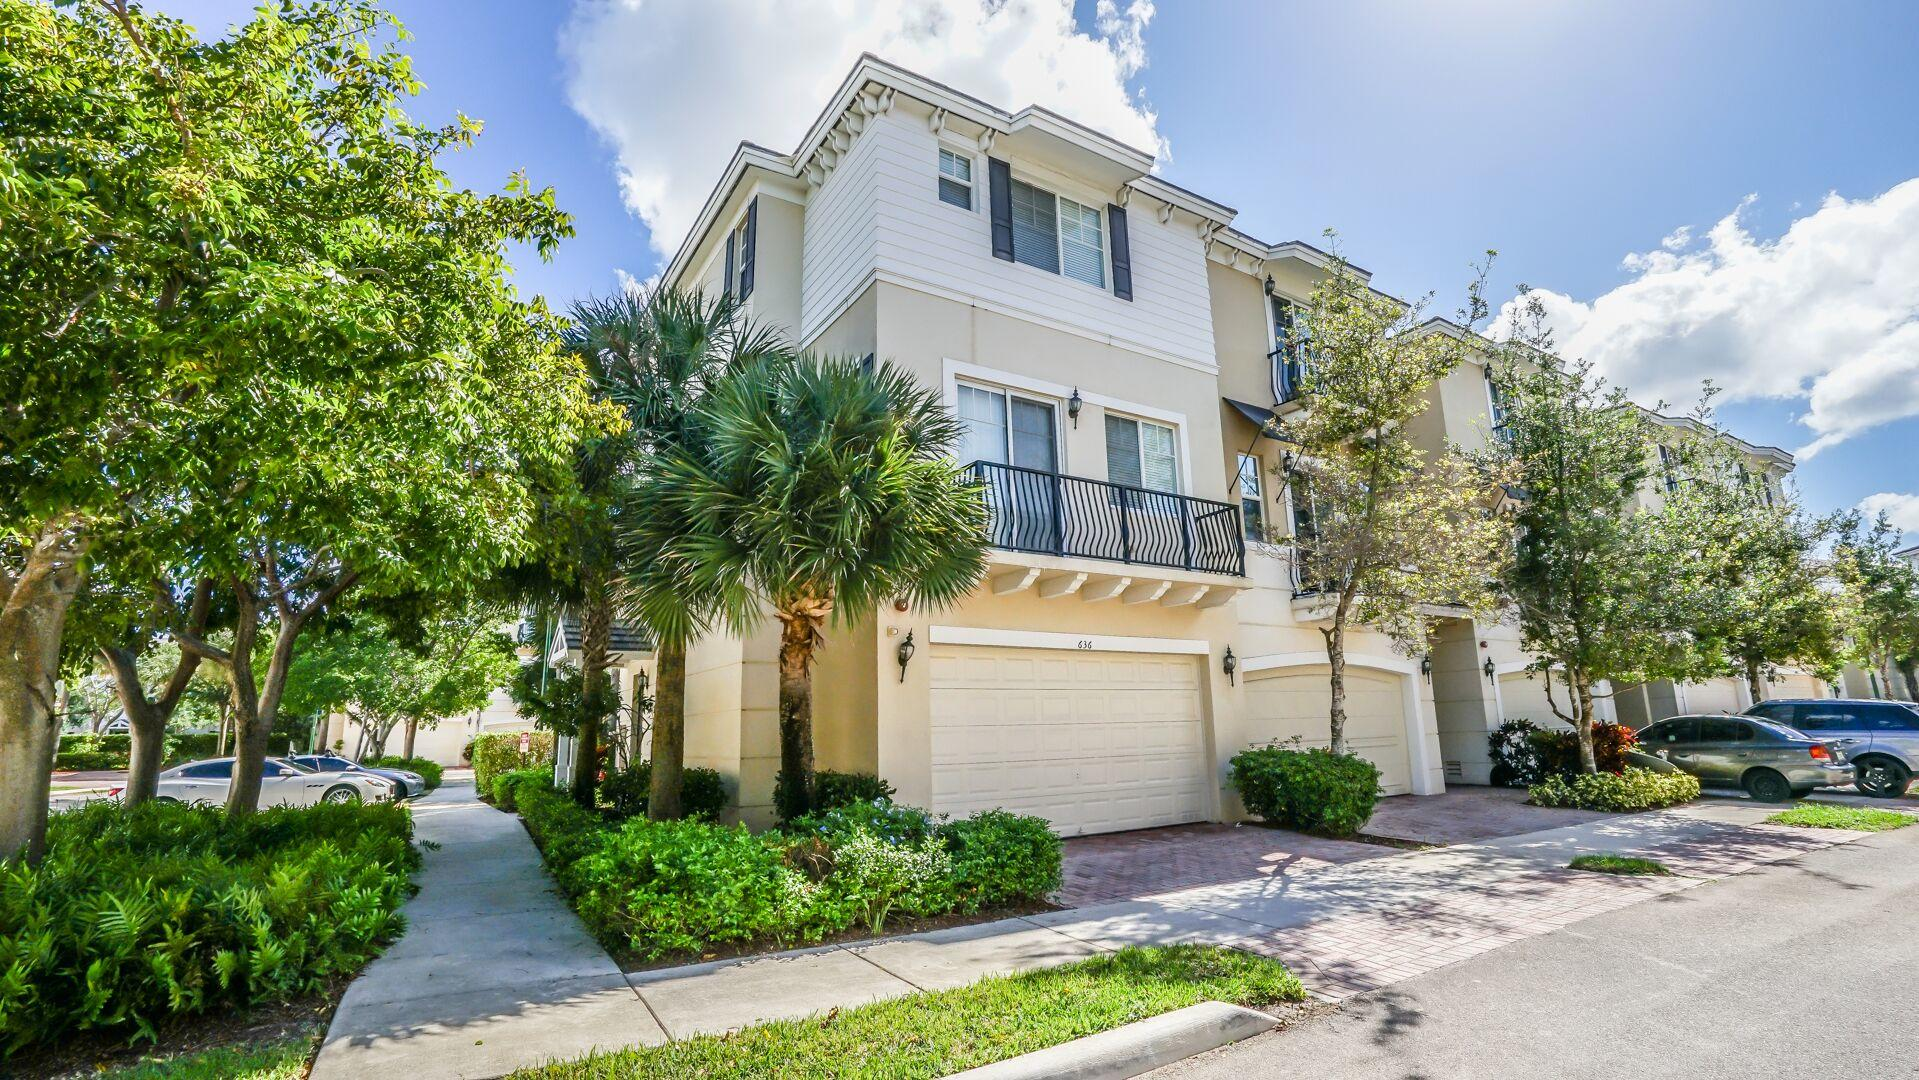 636 NW 38 Circle Boca Raton, FL 33431